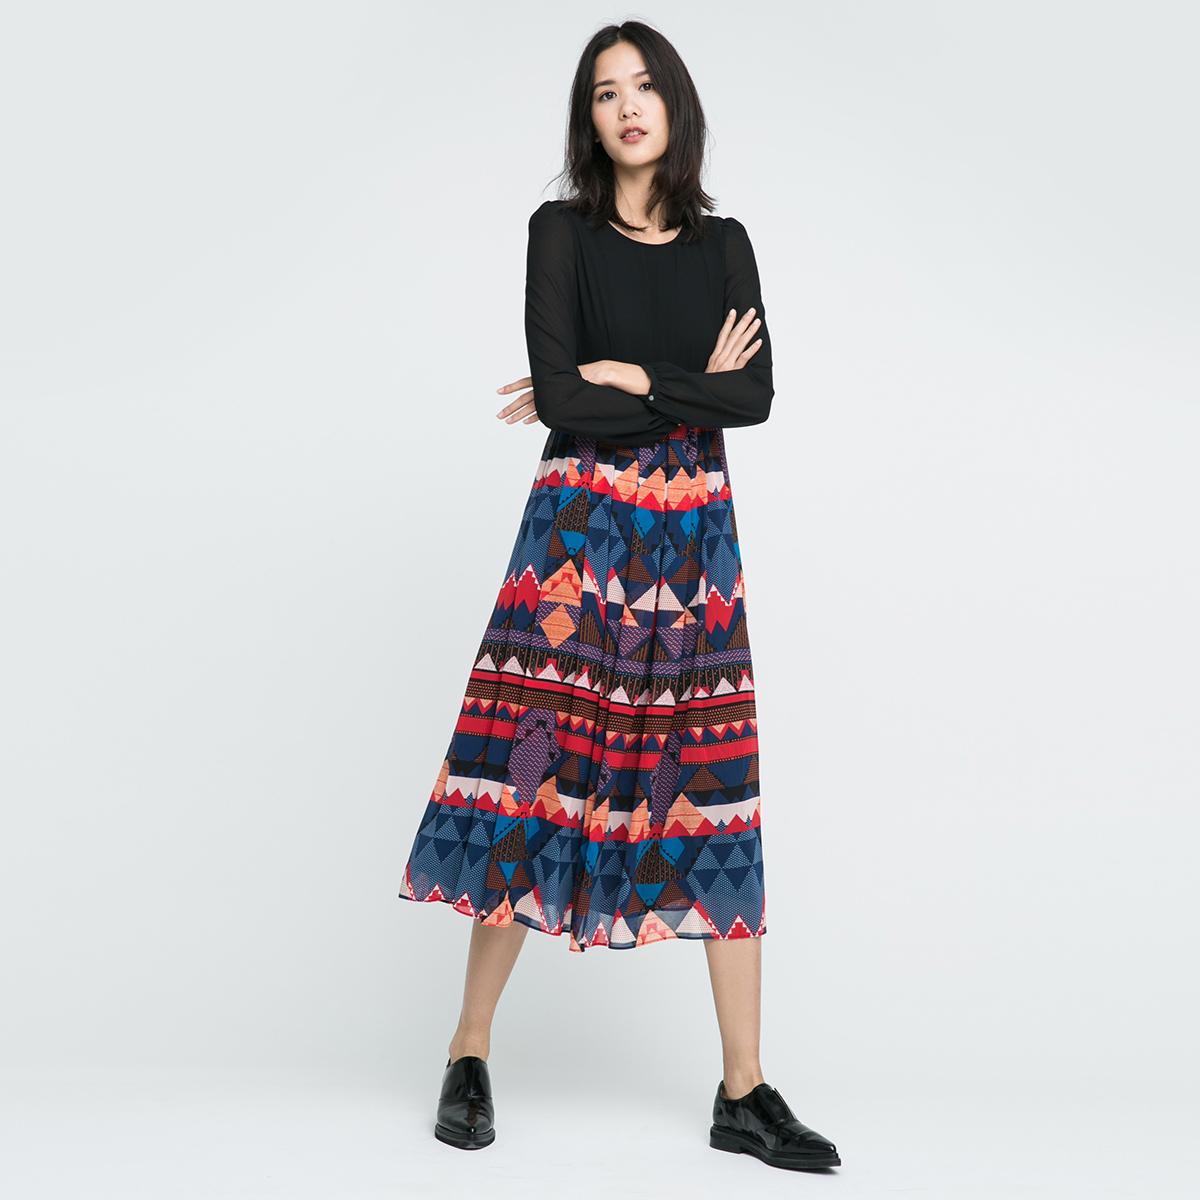 ONLY彩花拼接泡泡袖雪纺连衣裙女-116307519